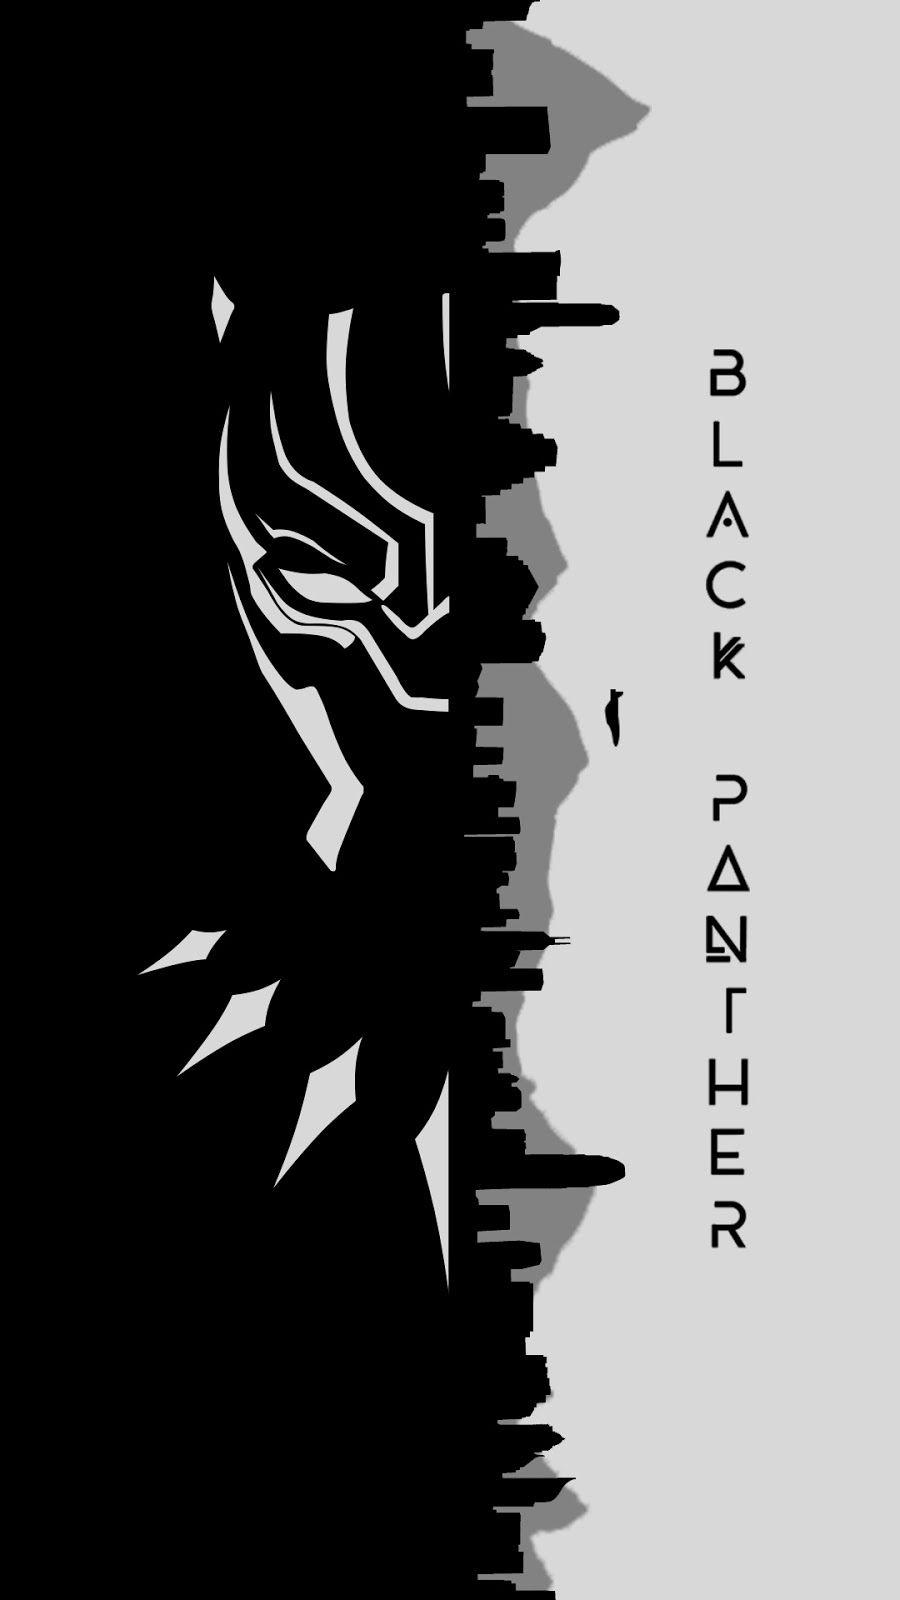 Black Panther Wallpaper Black Panther Marvel Black Panther Superhero Wallpaper